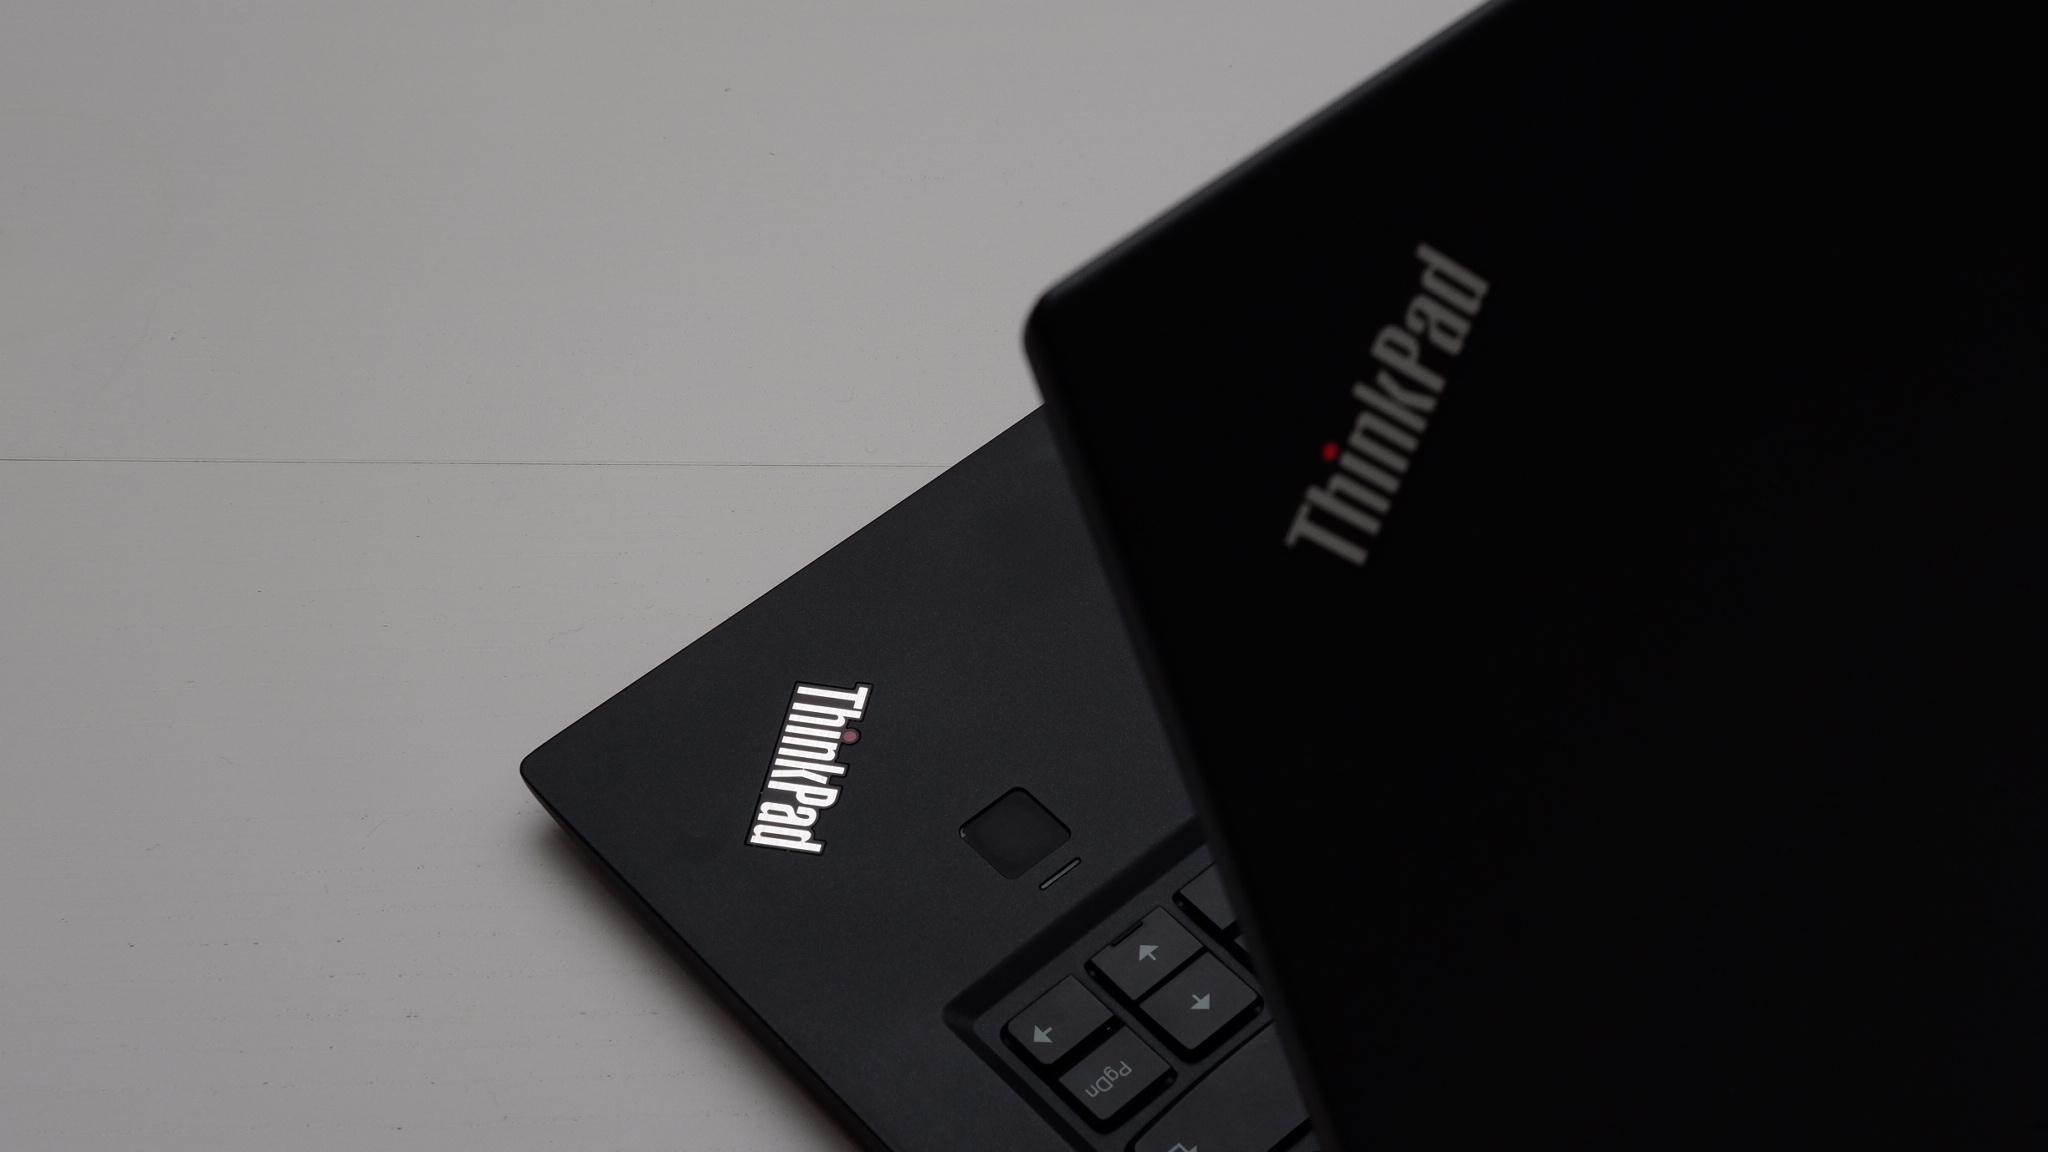 Den ikoniske ThinkPad-logoen pryder både lokket og tastaturflaten.